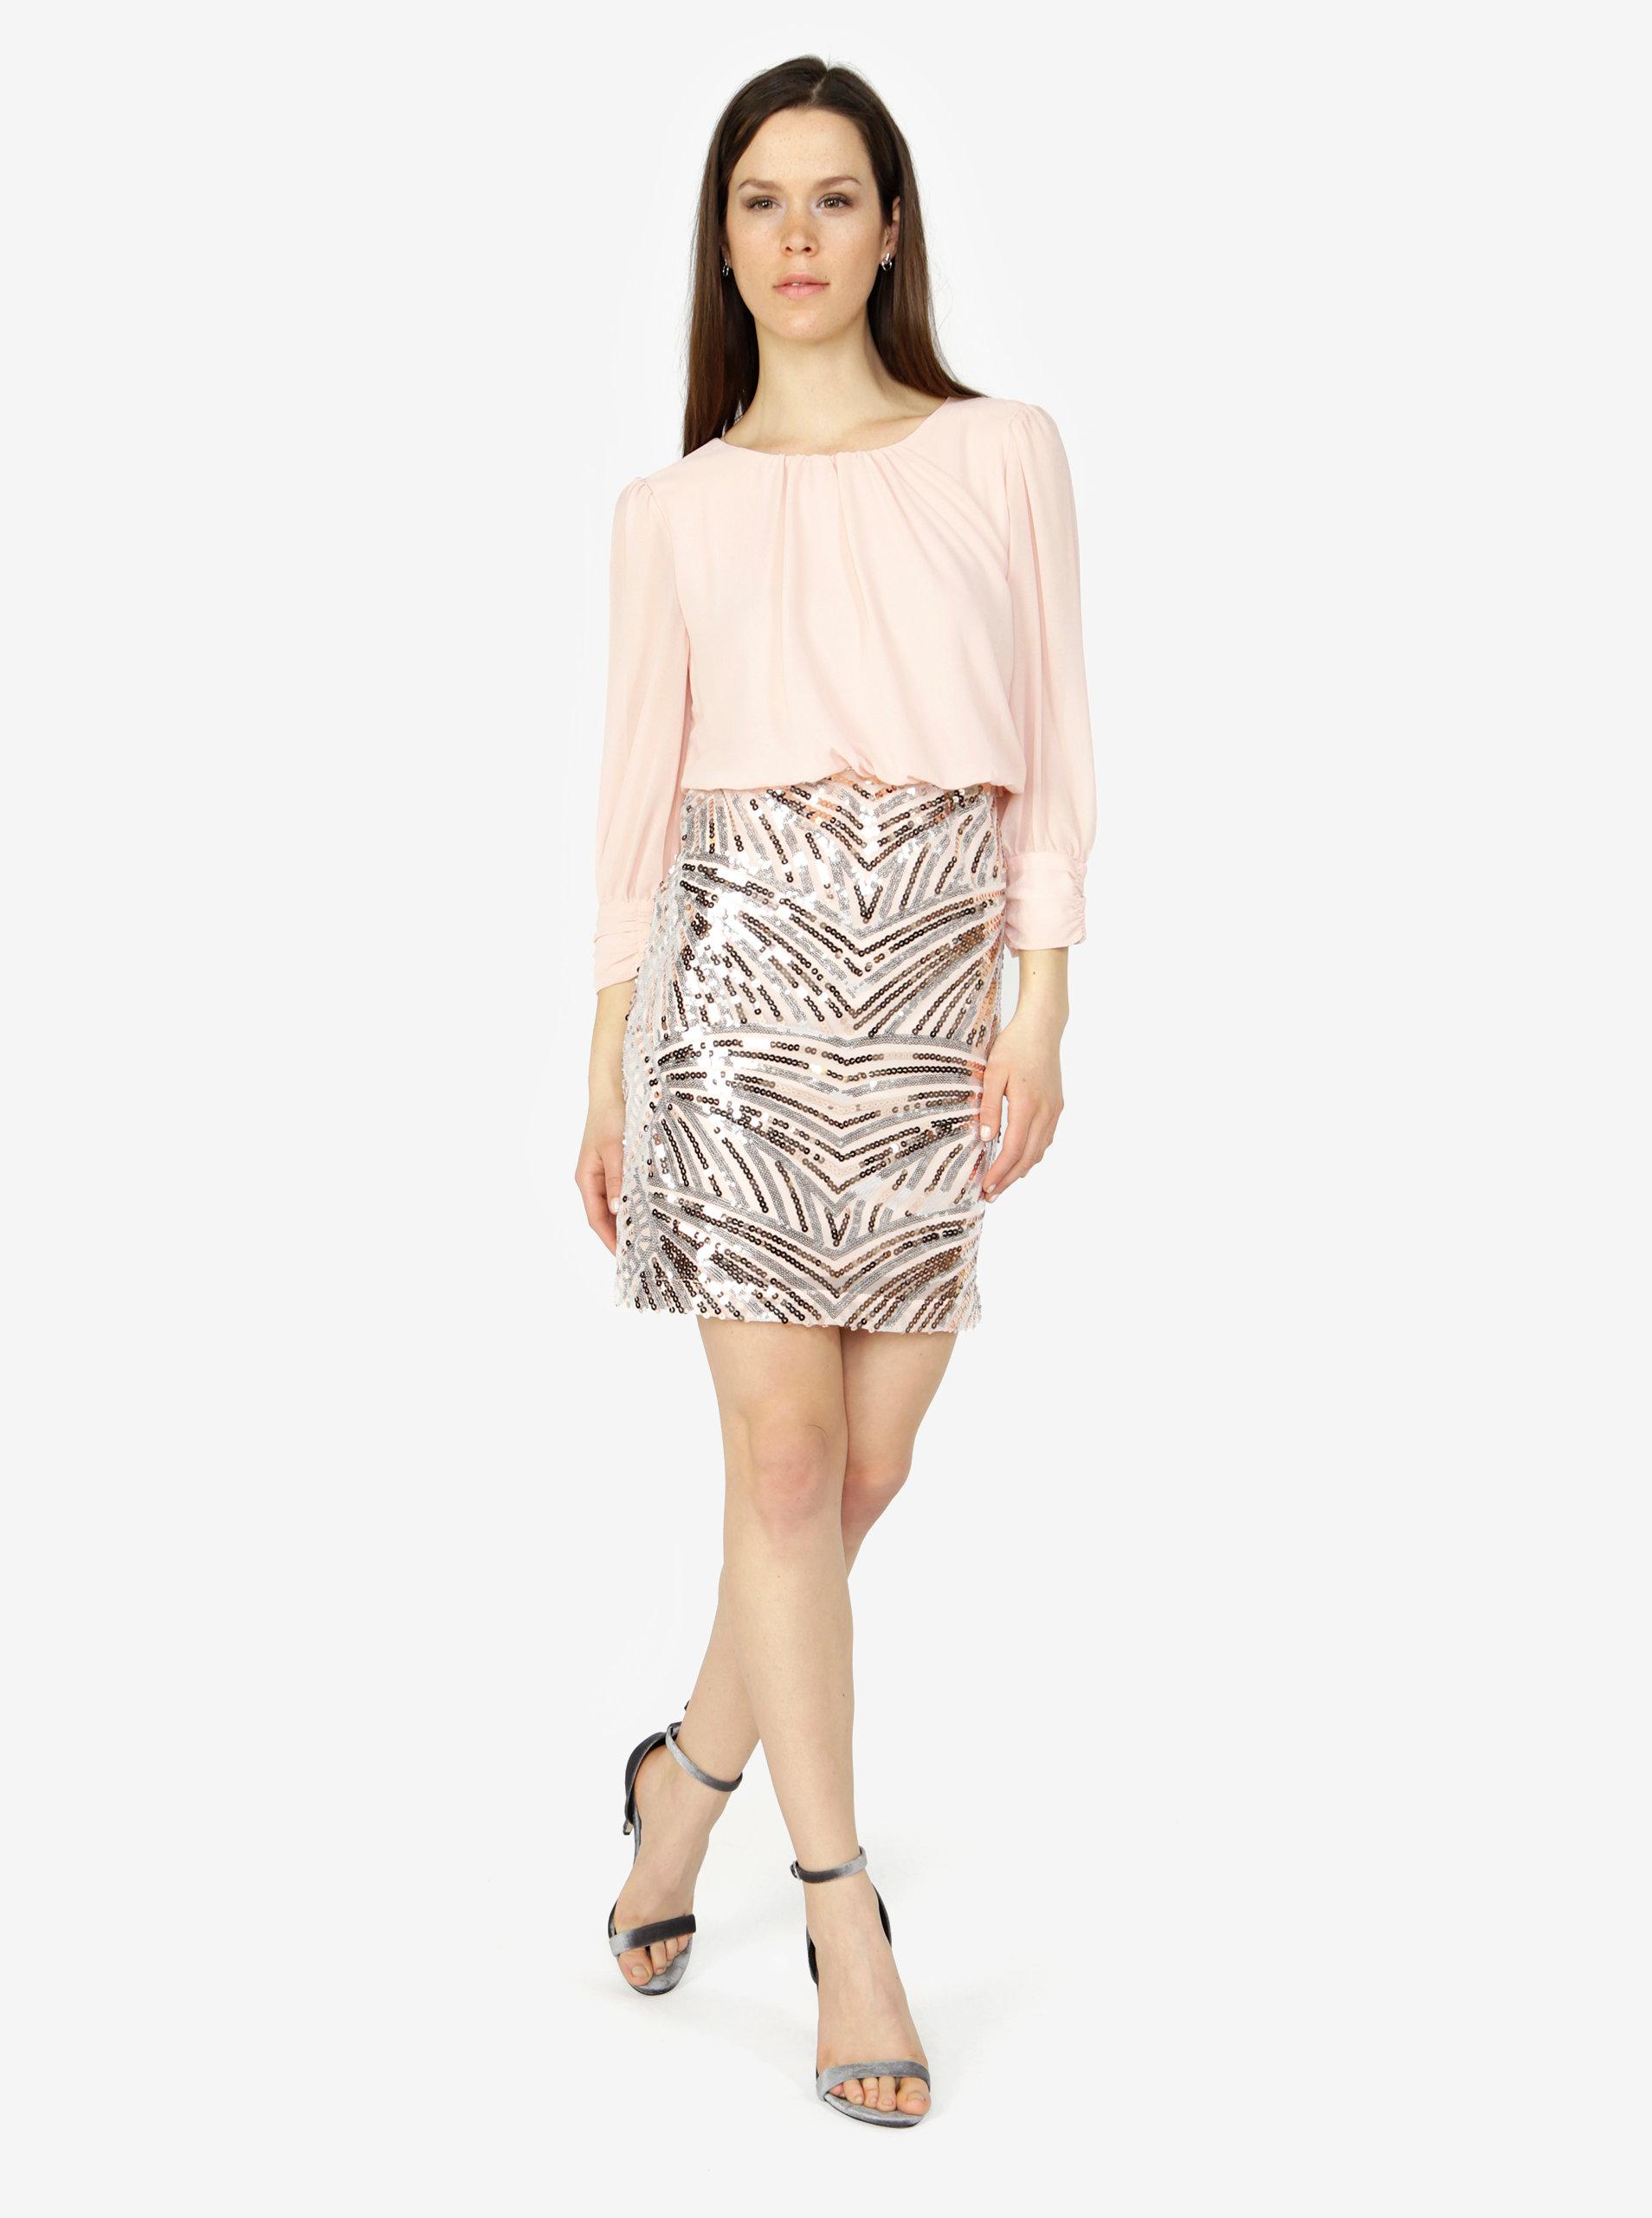 Staroružové šaty s flitrami VERO MODA Elenora ... 6be34aa047d